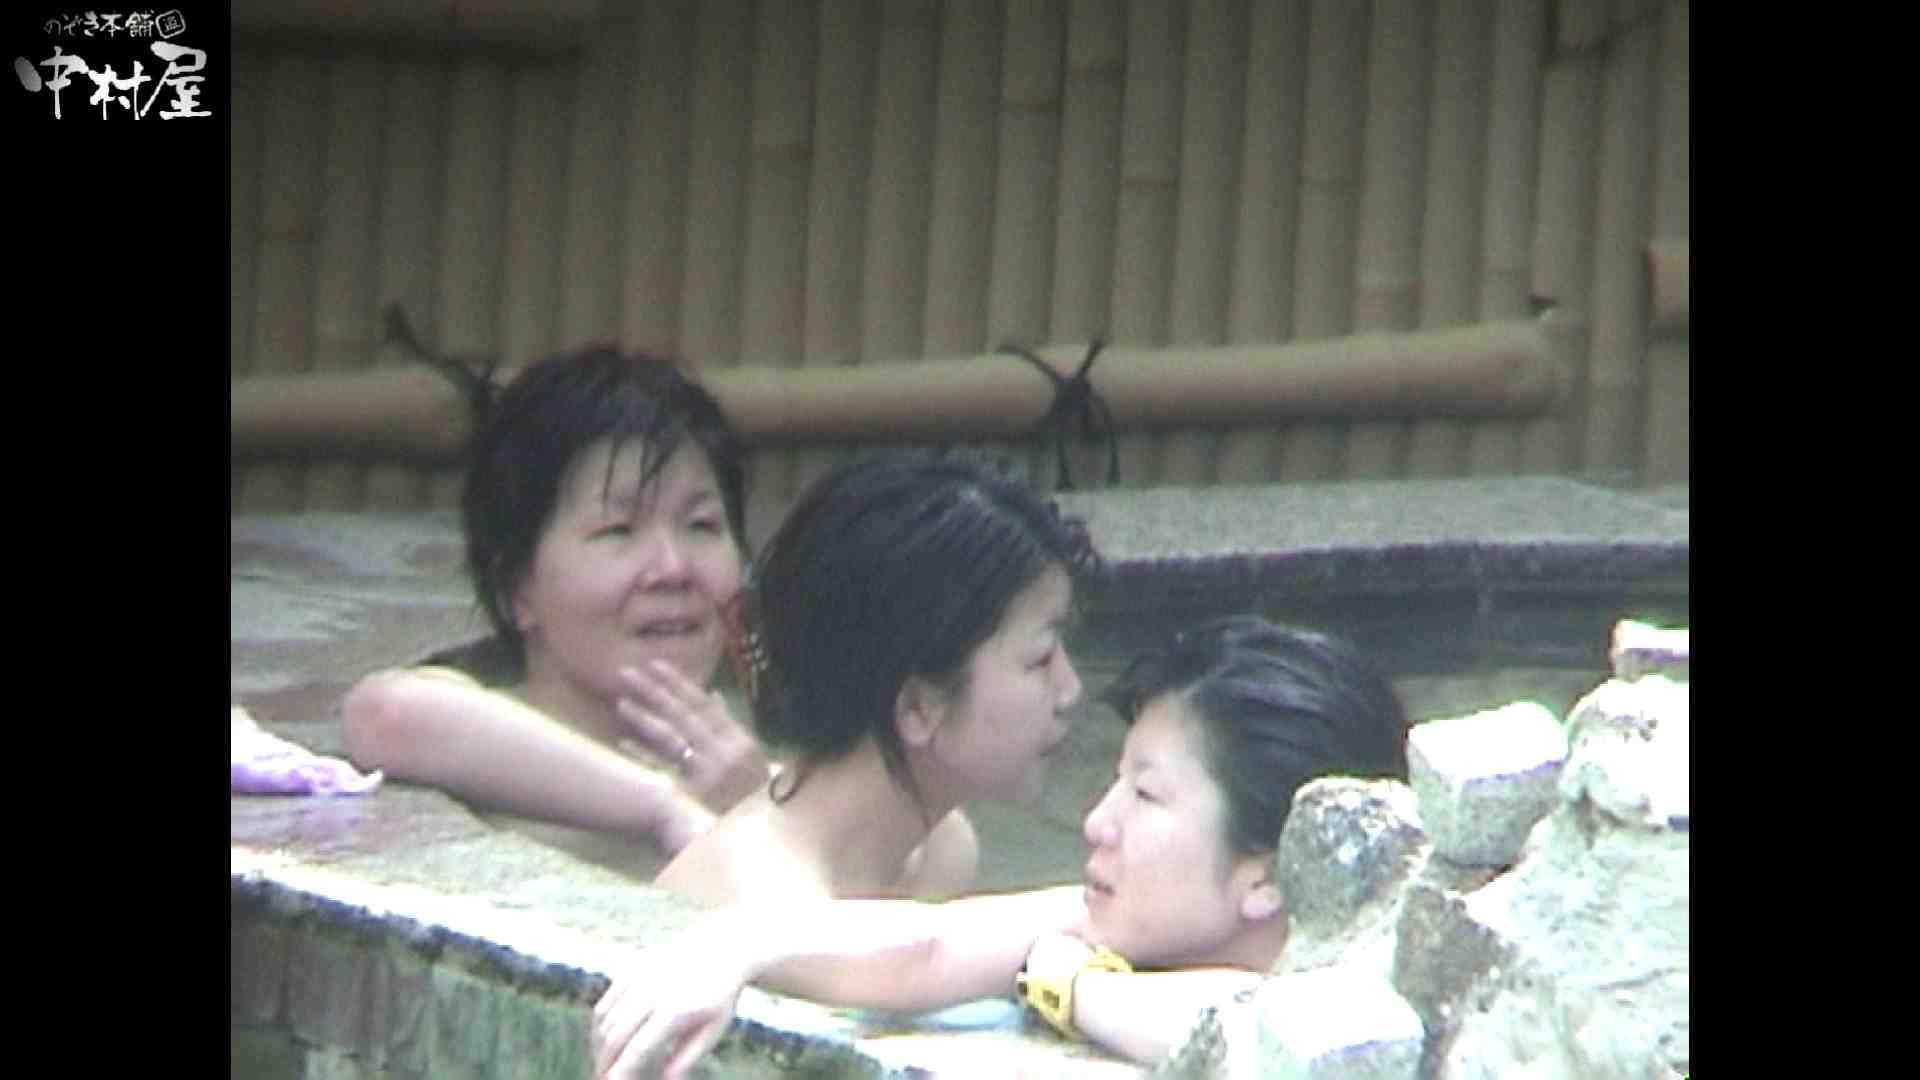 Aquaな露天風呂Vol.936 盗撮映像  110Pix 60